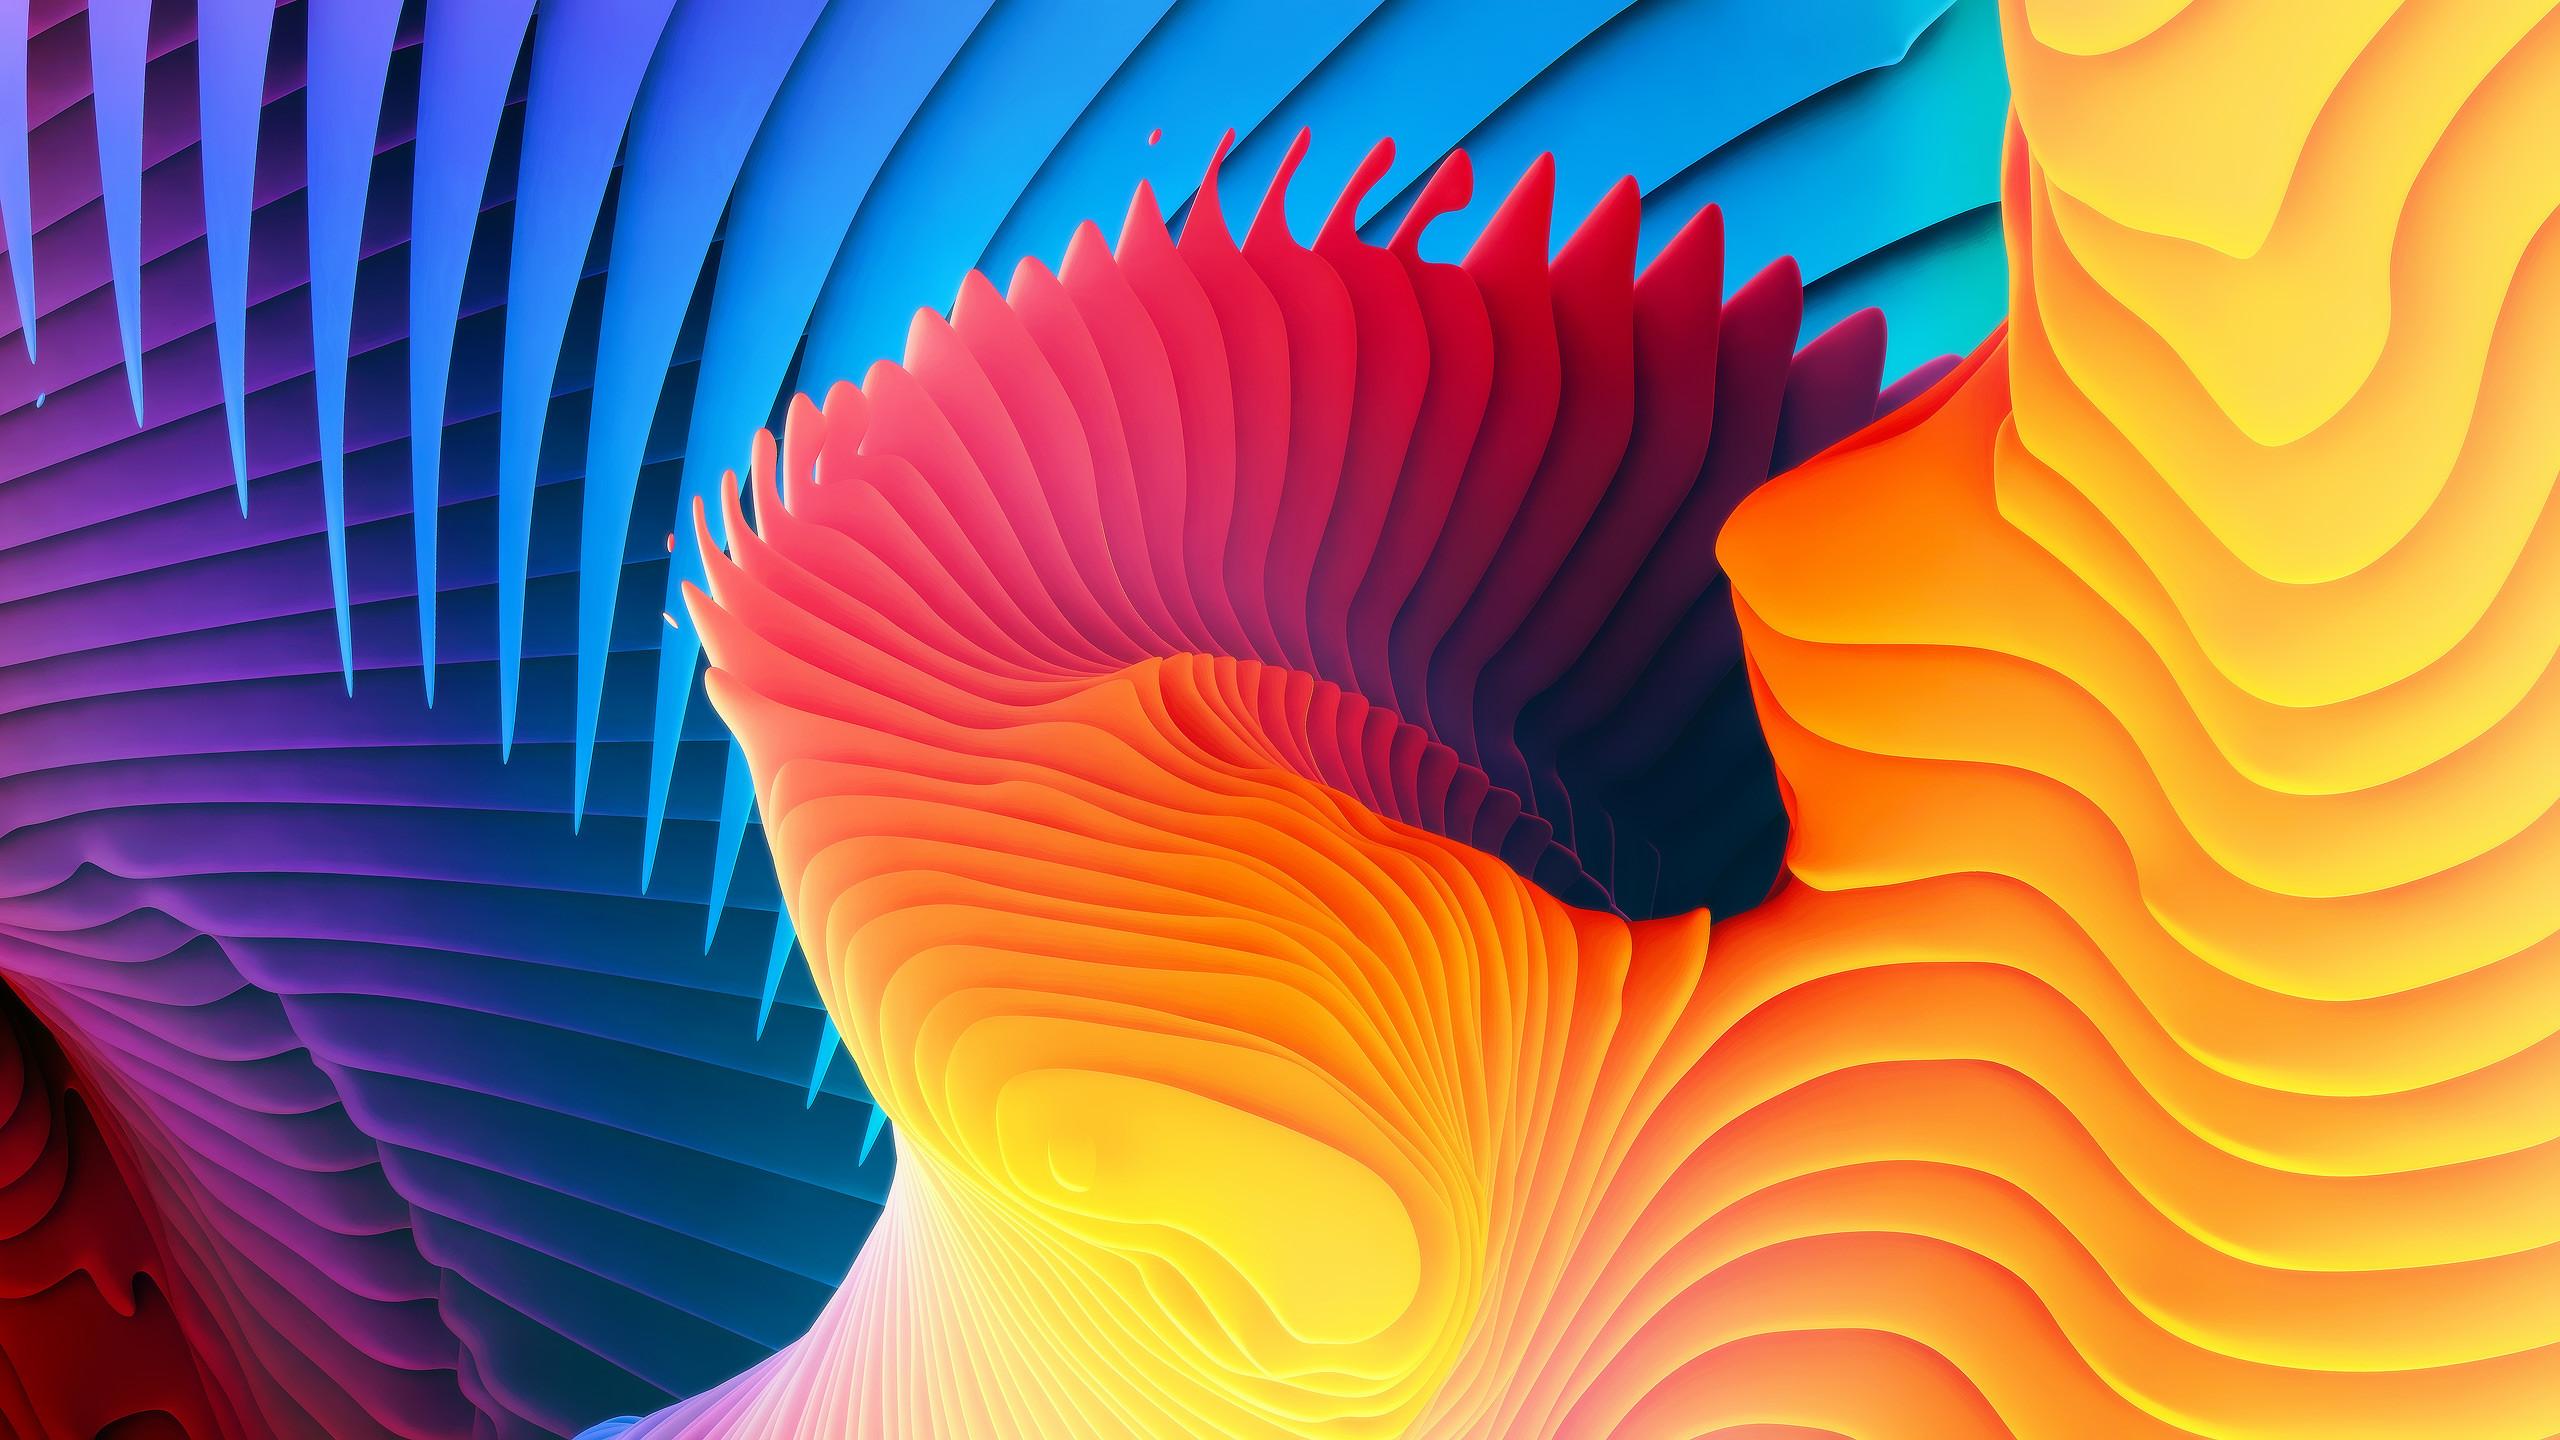 MacBook Pro Event Wallpaper ari weinkle Spiral_2B. Download via  @airweinkle: desktop (2560 …